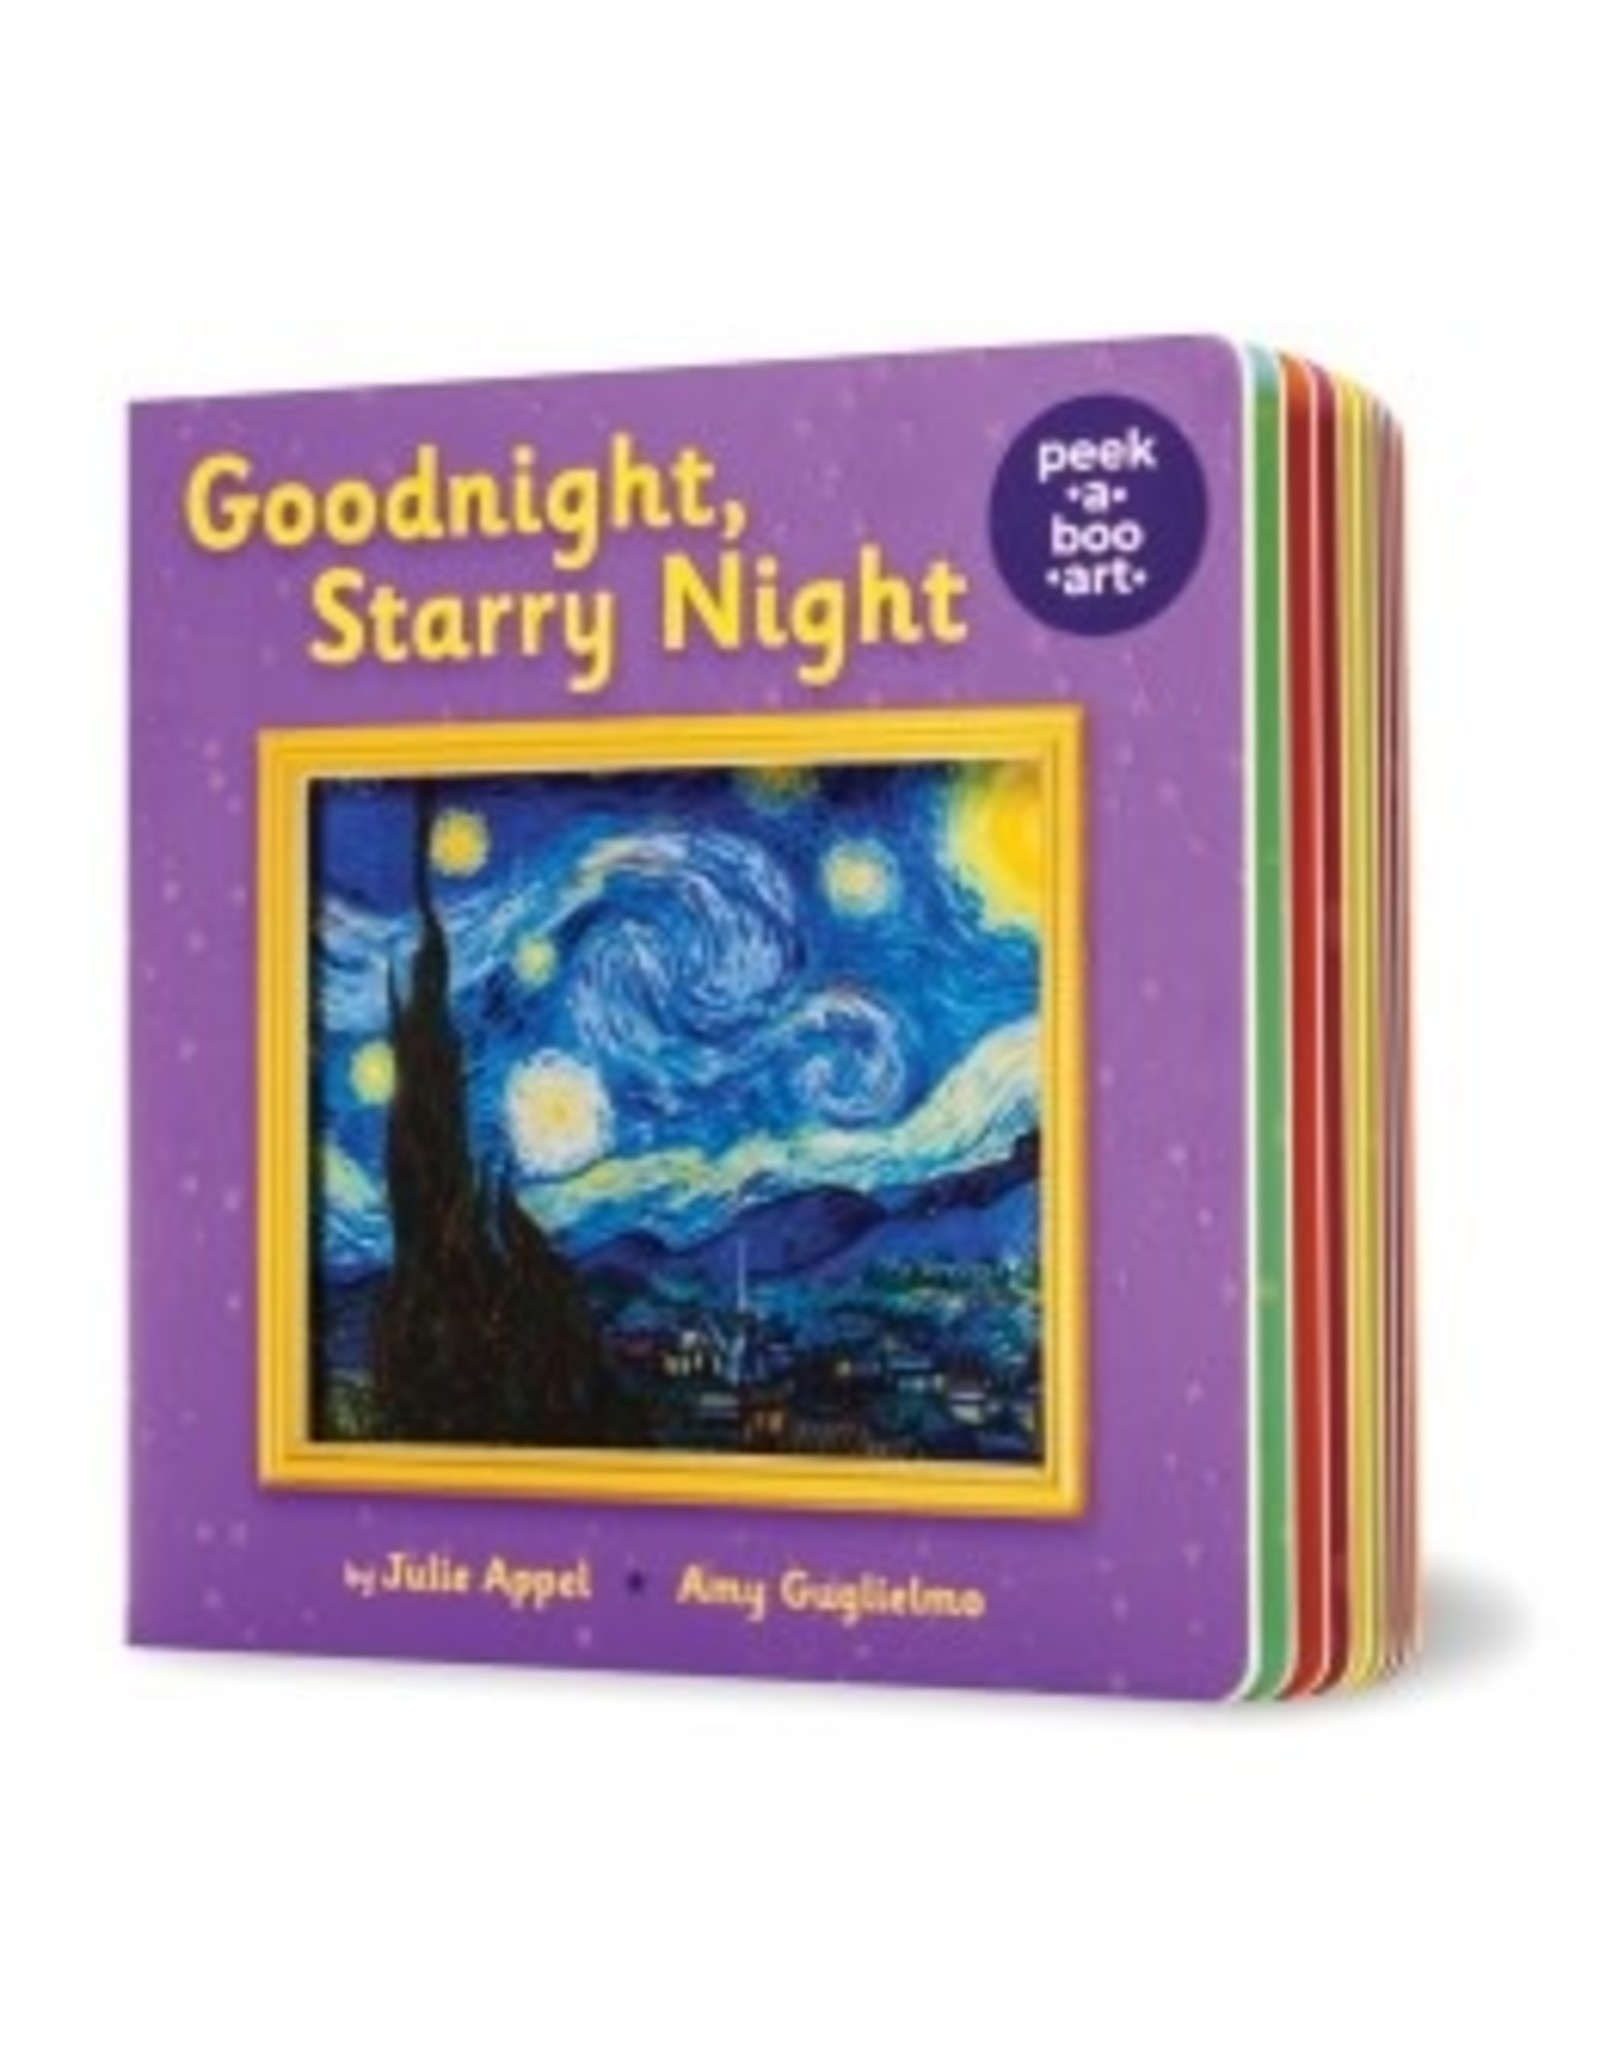 Scholastic Goodnight, Starry Night (Peek-a-Boo Art)